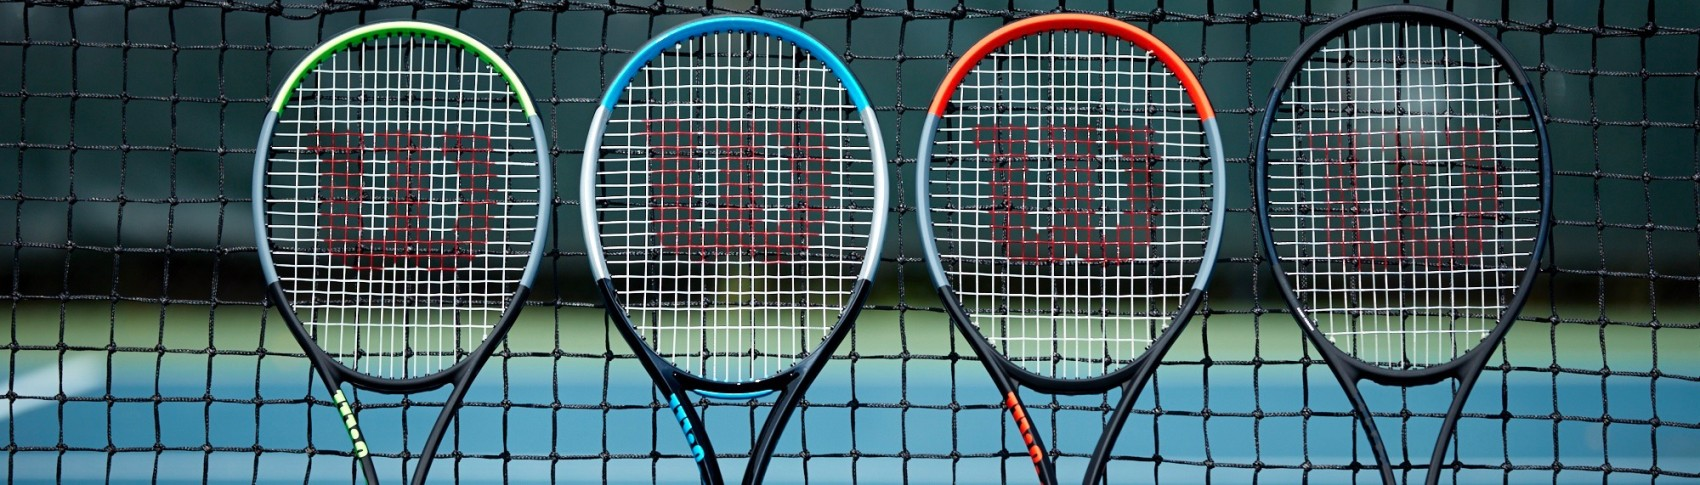 Tennispolos